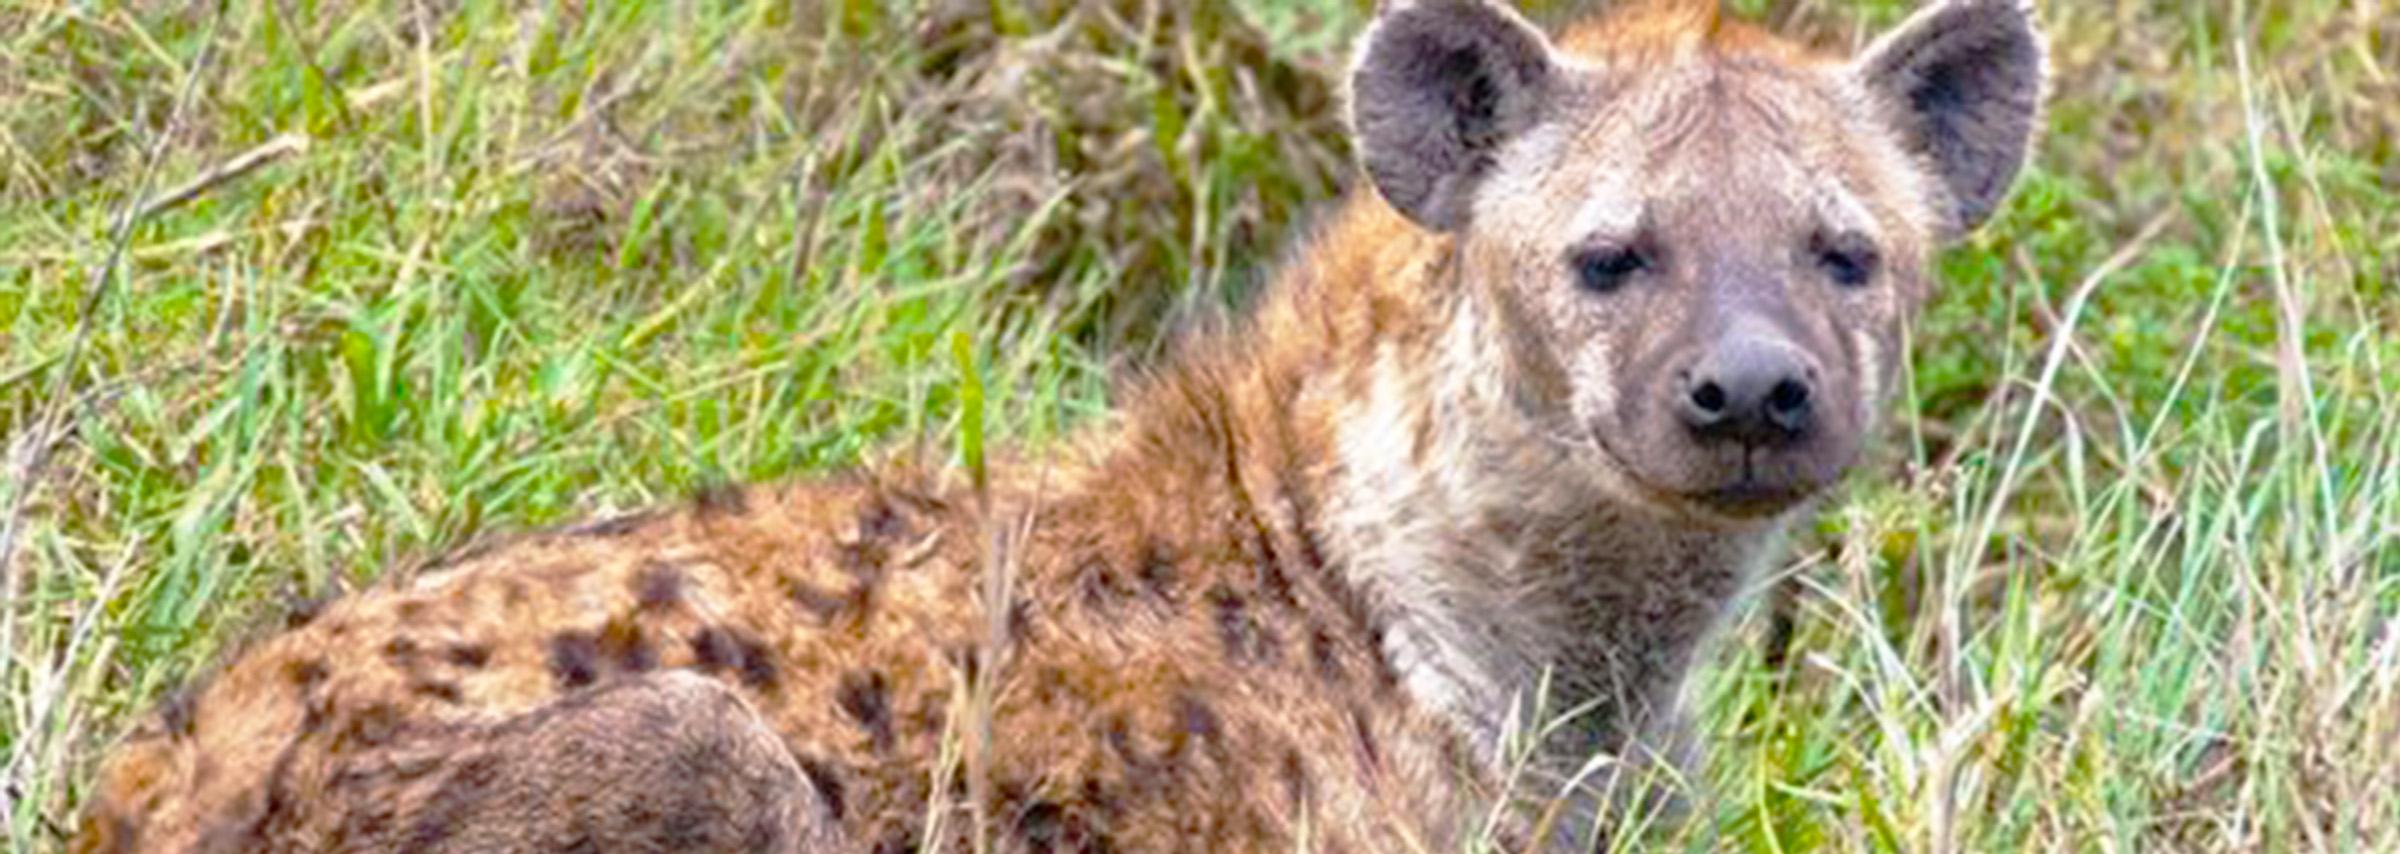 Hyenas The Carnivorous Animals - Uganda Safari Chapter